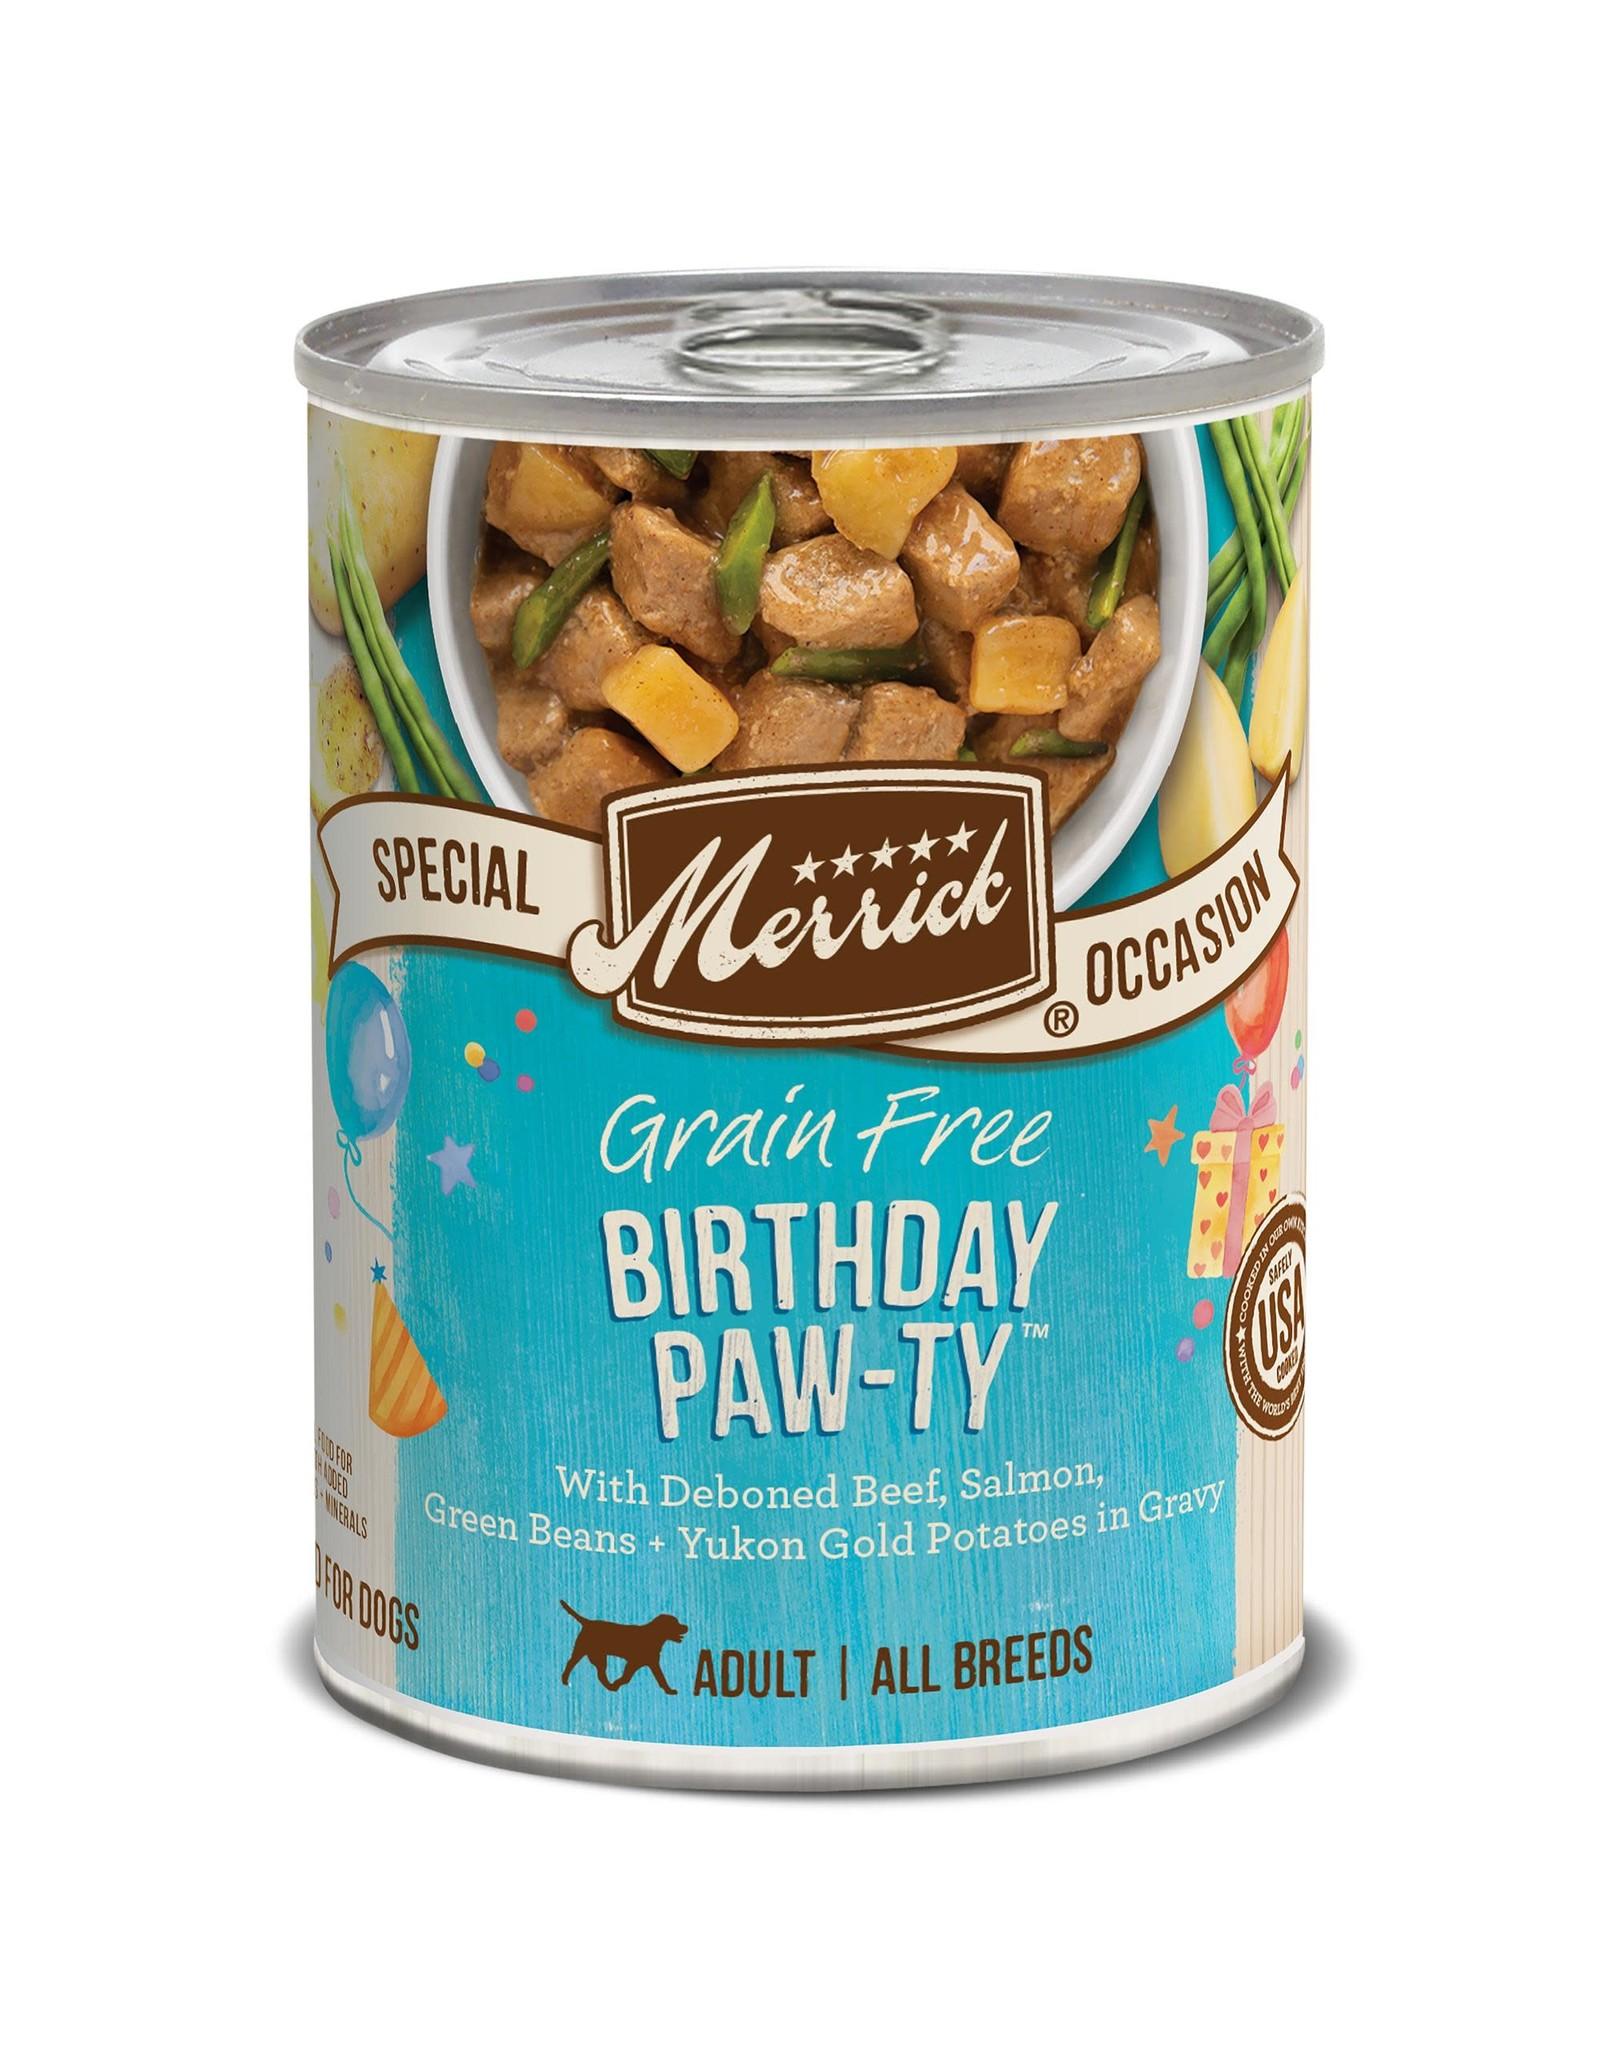 Merrick Merrick Grain-Free Birthday Paw-ty Dog Food 12.7oz